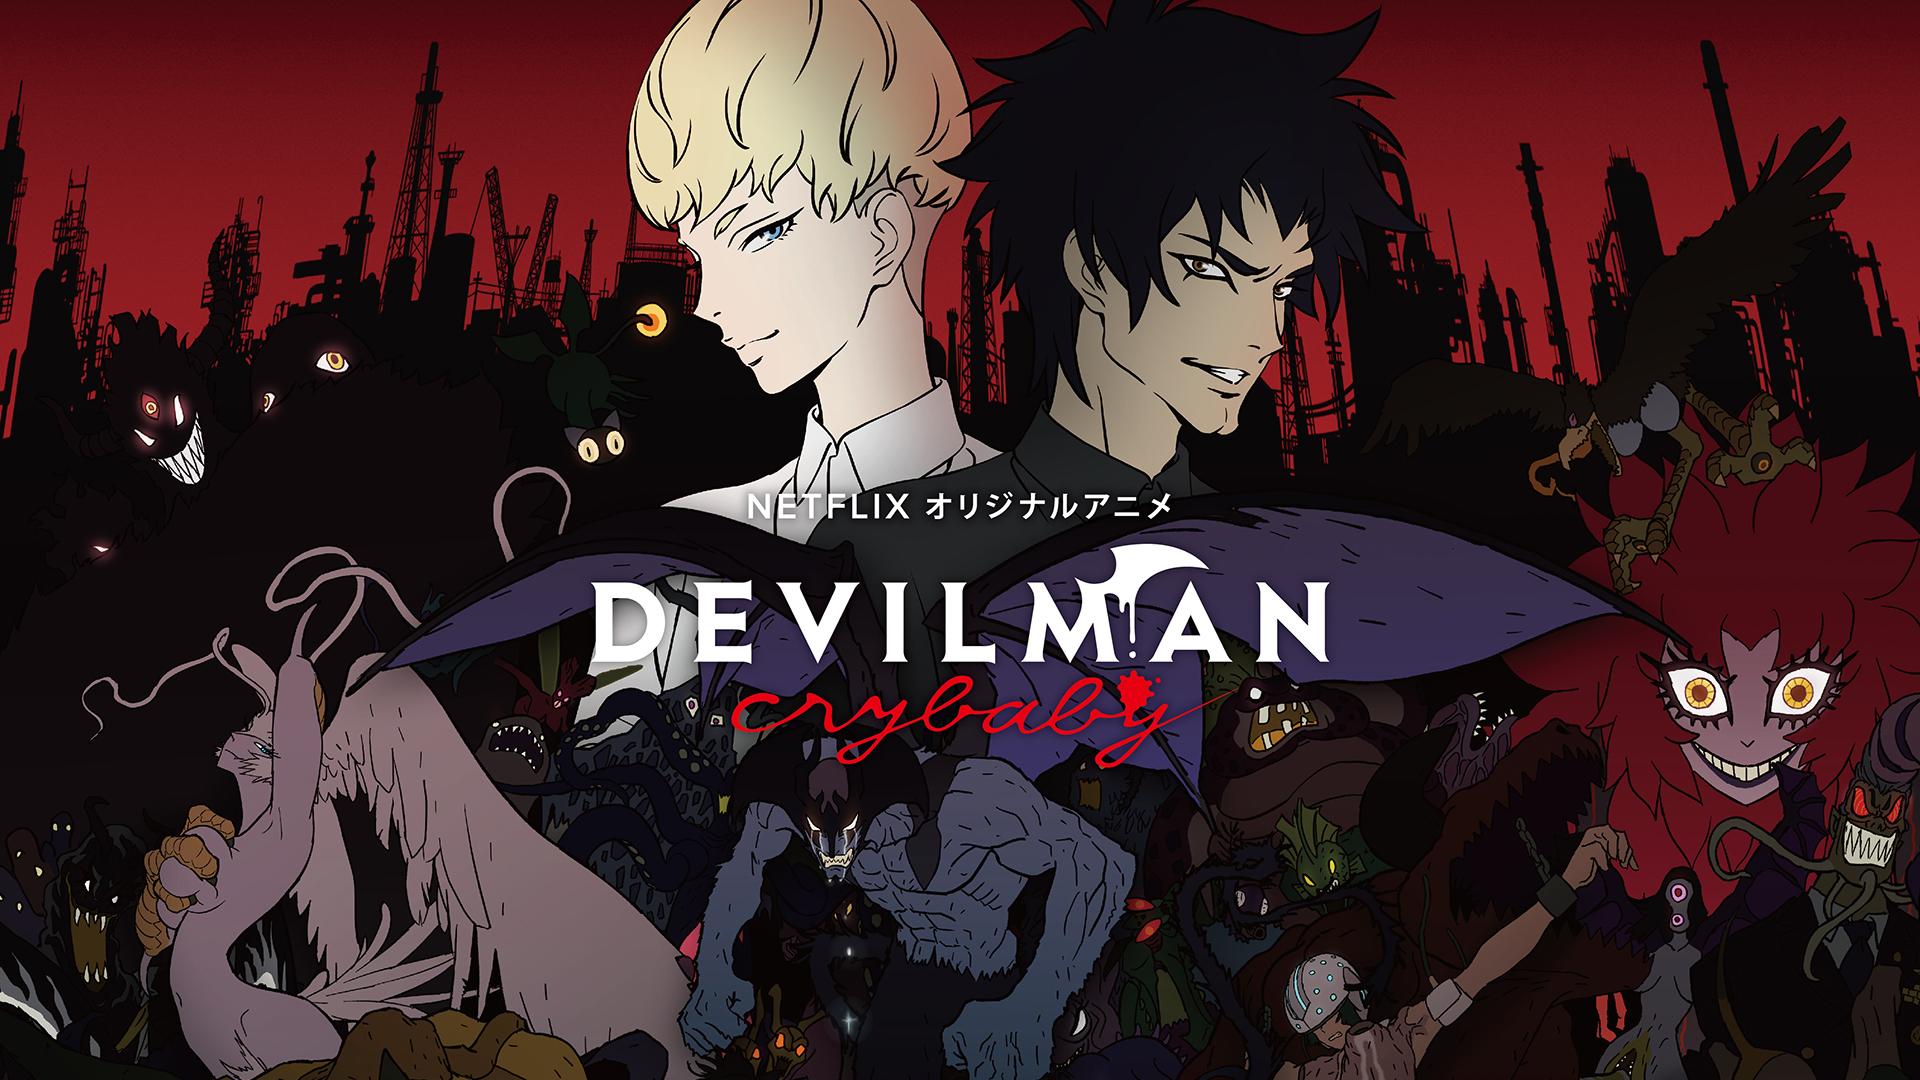 Devilman crybaby anime on netflix